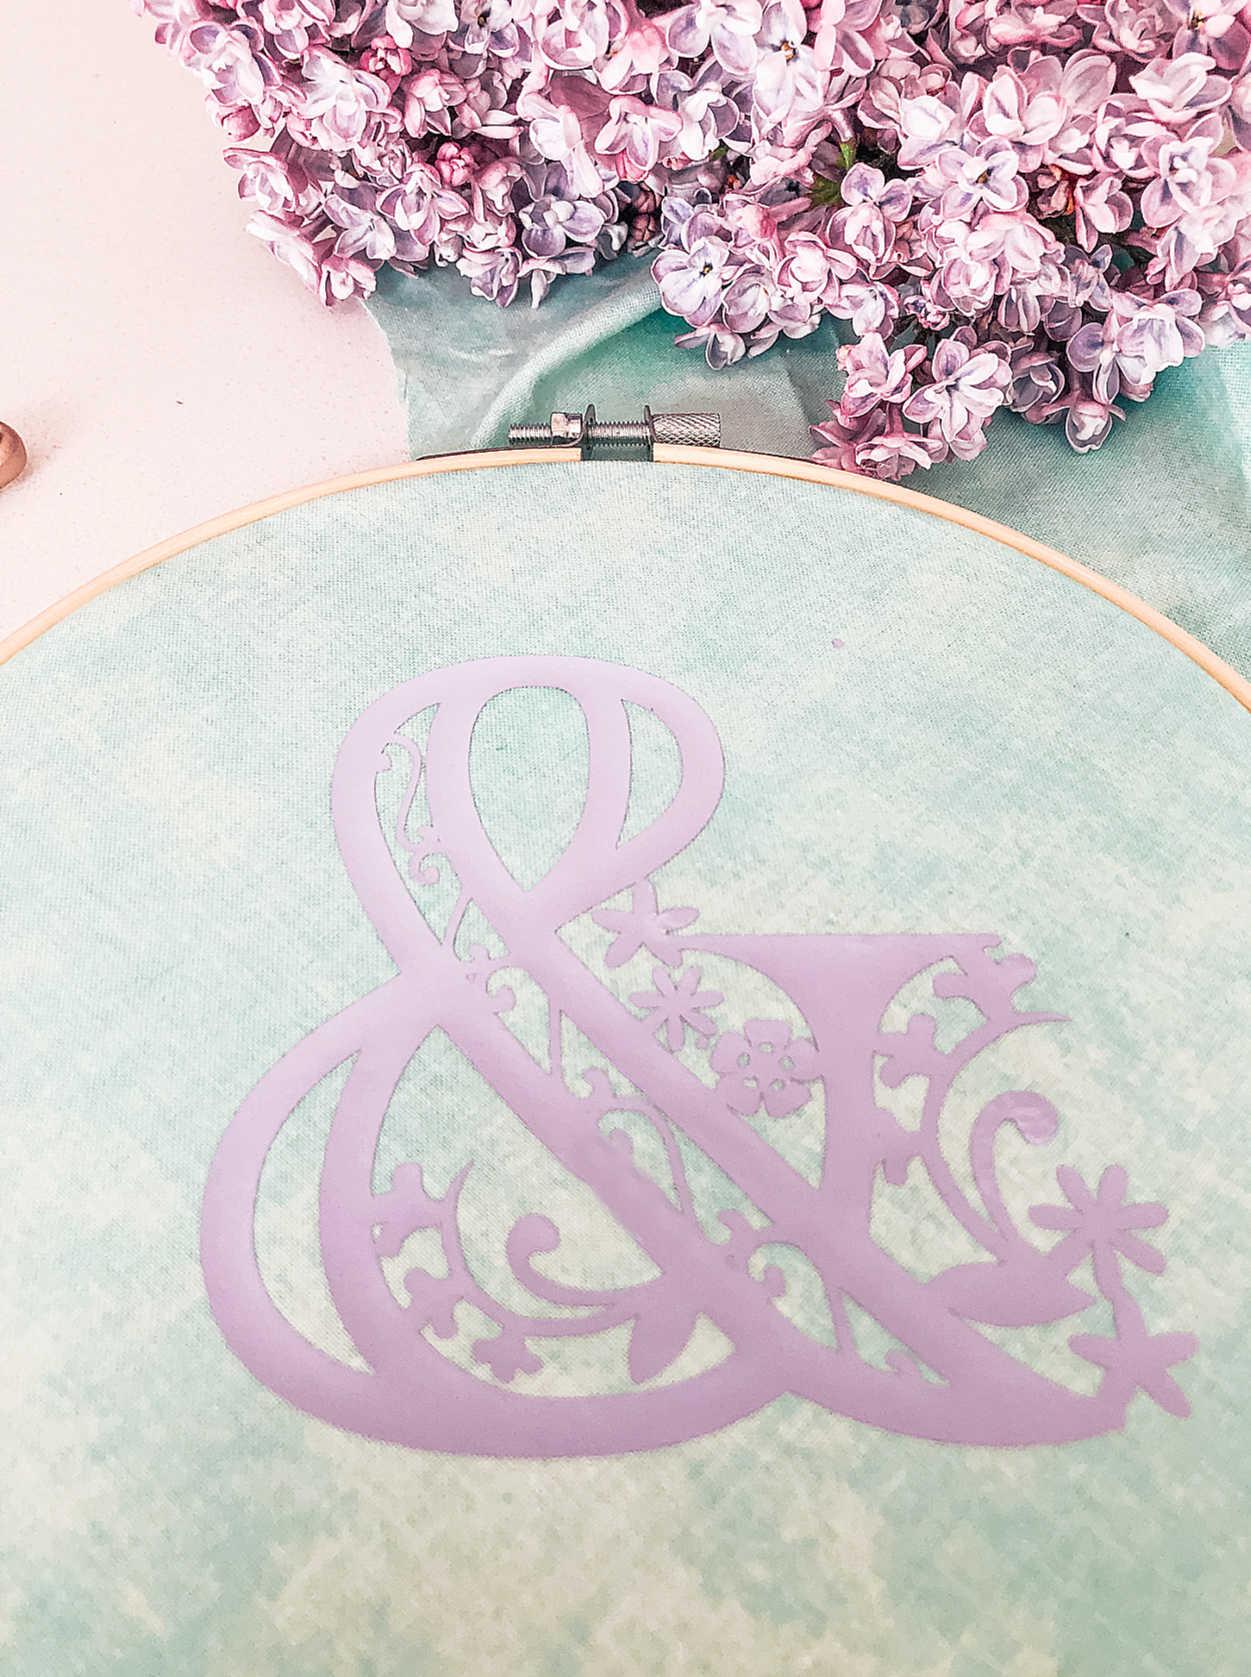 DIY Embroidery Hoop With Cricut Iron On Vinyl